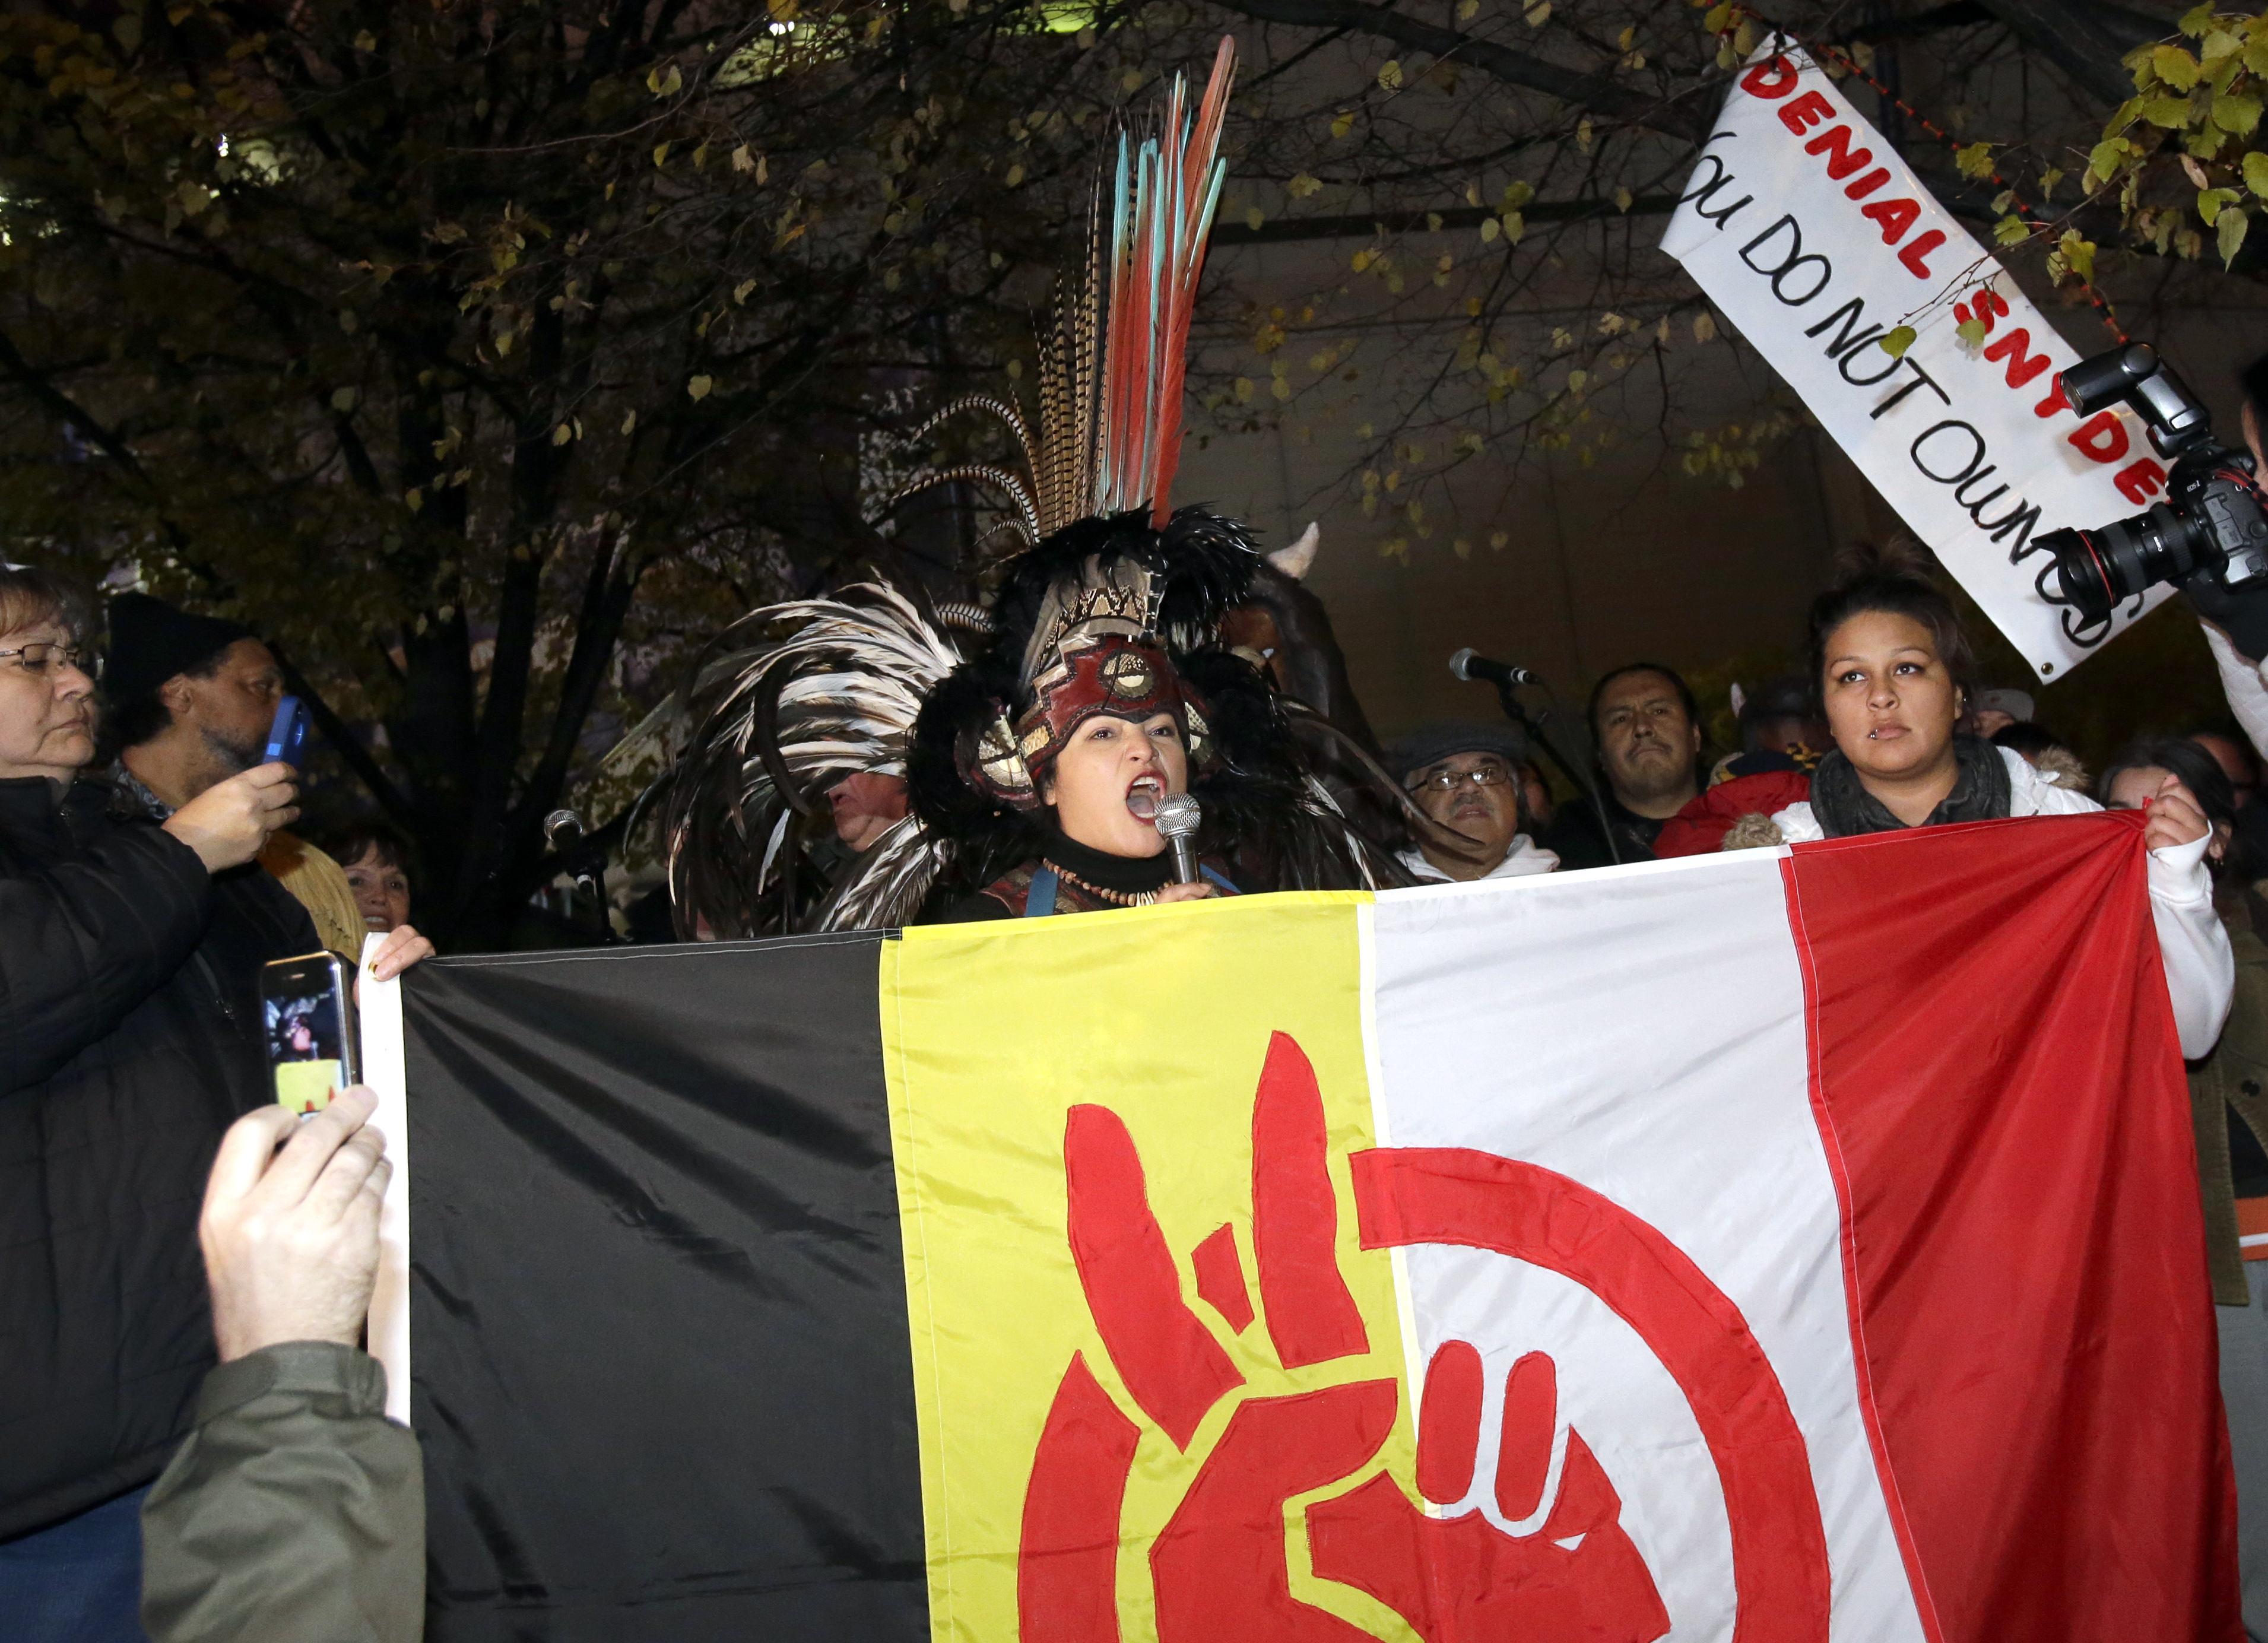 Hundreds rally in Minn. against Redskins' name